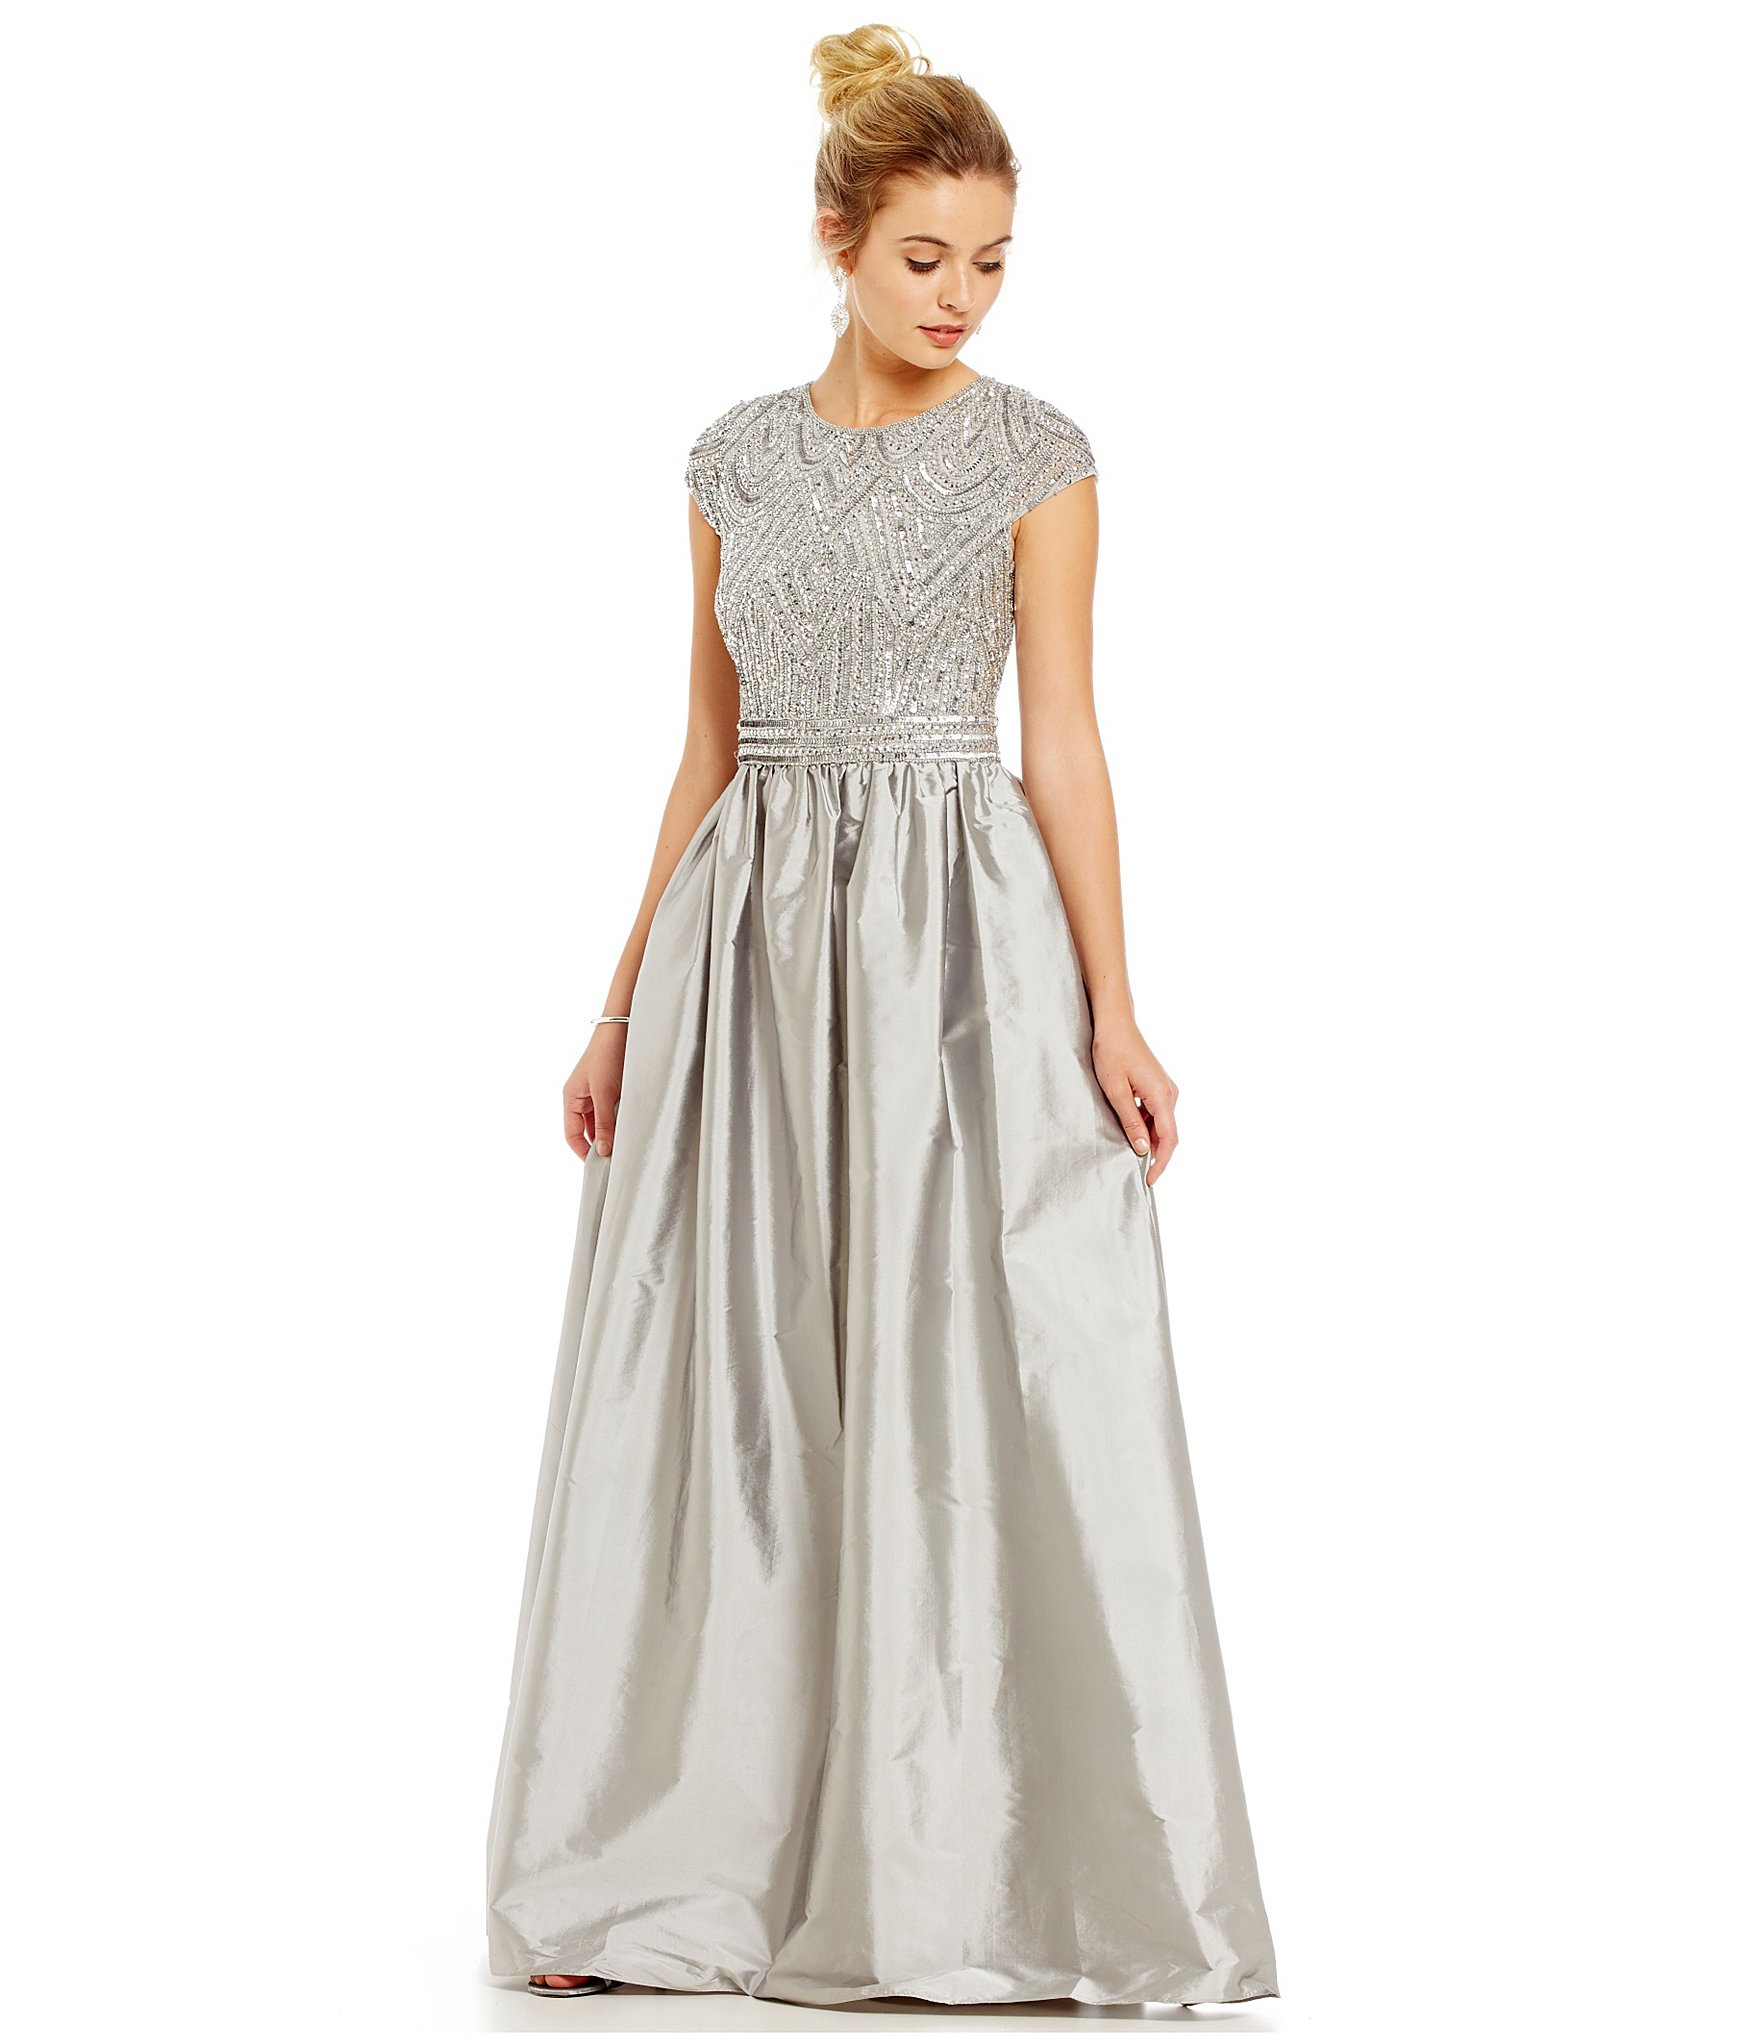 6e4a618c21628f Adrianna Papell Beaded Bodice Taffeta Skirt Ballgown in Gray - Lyst